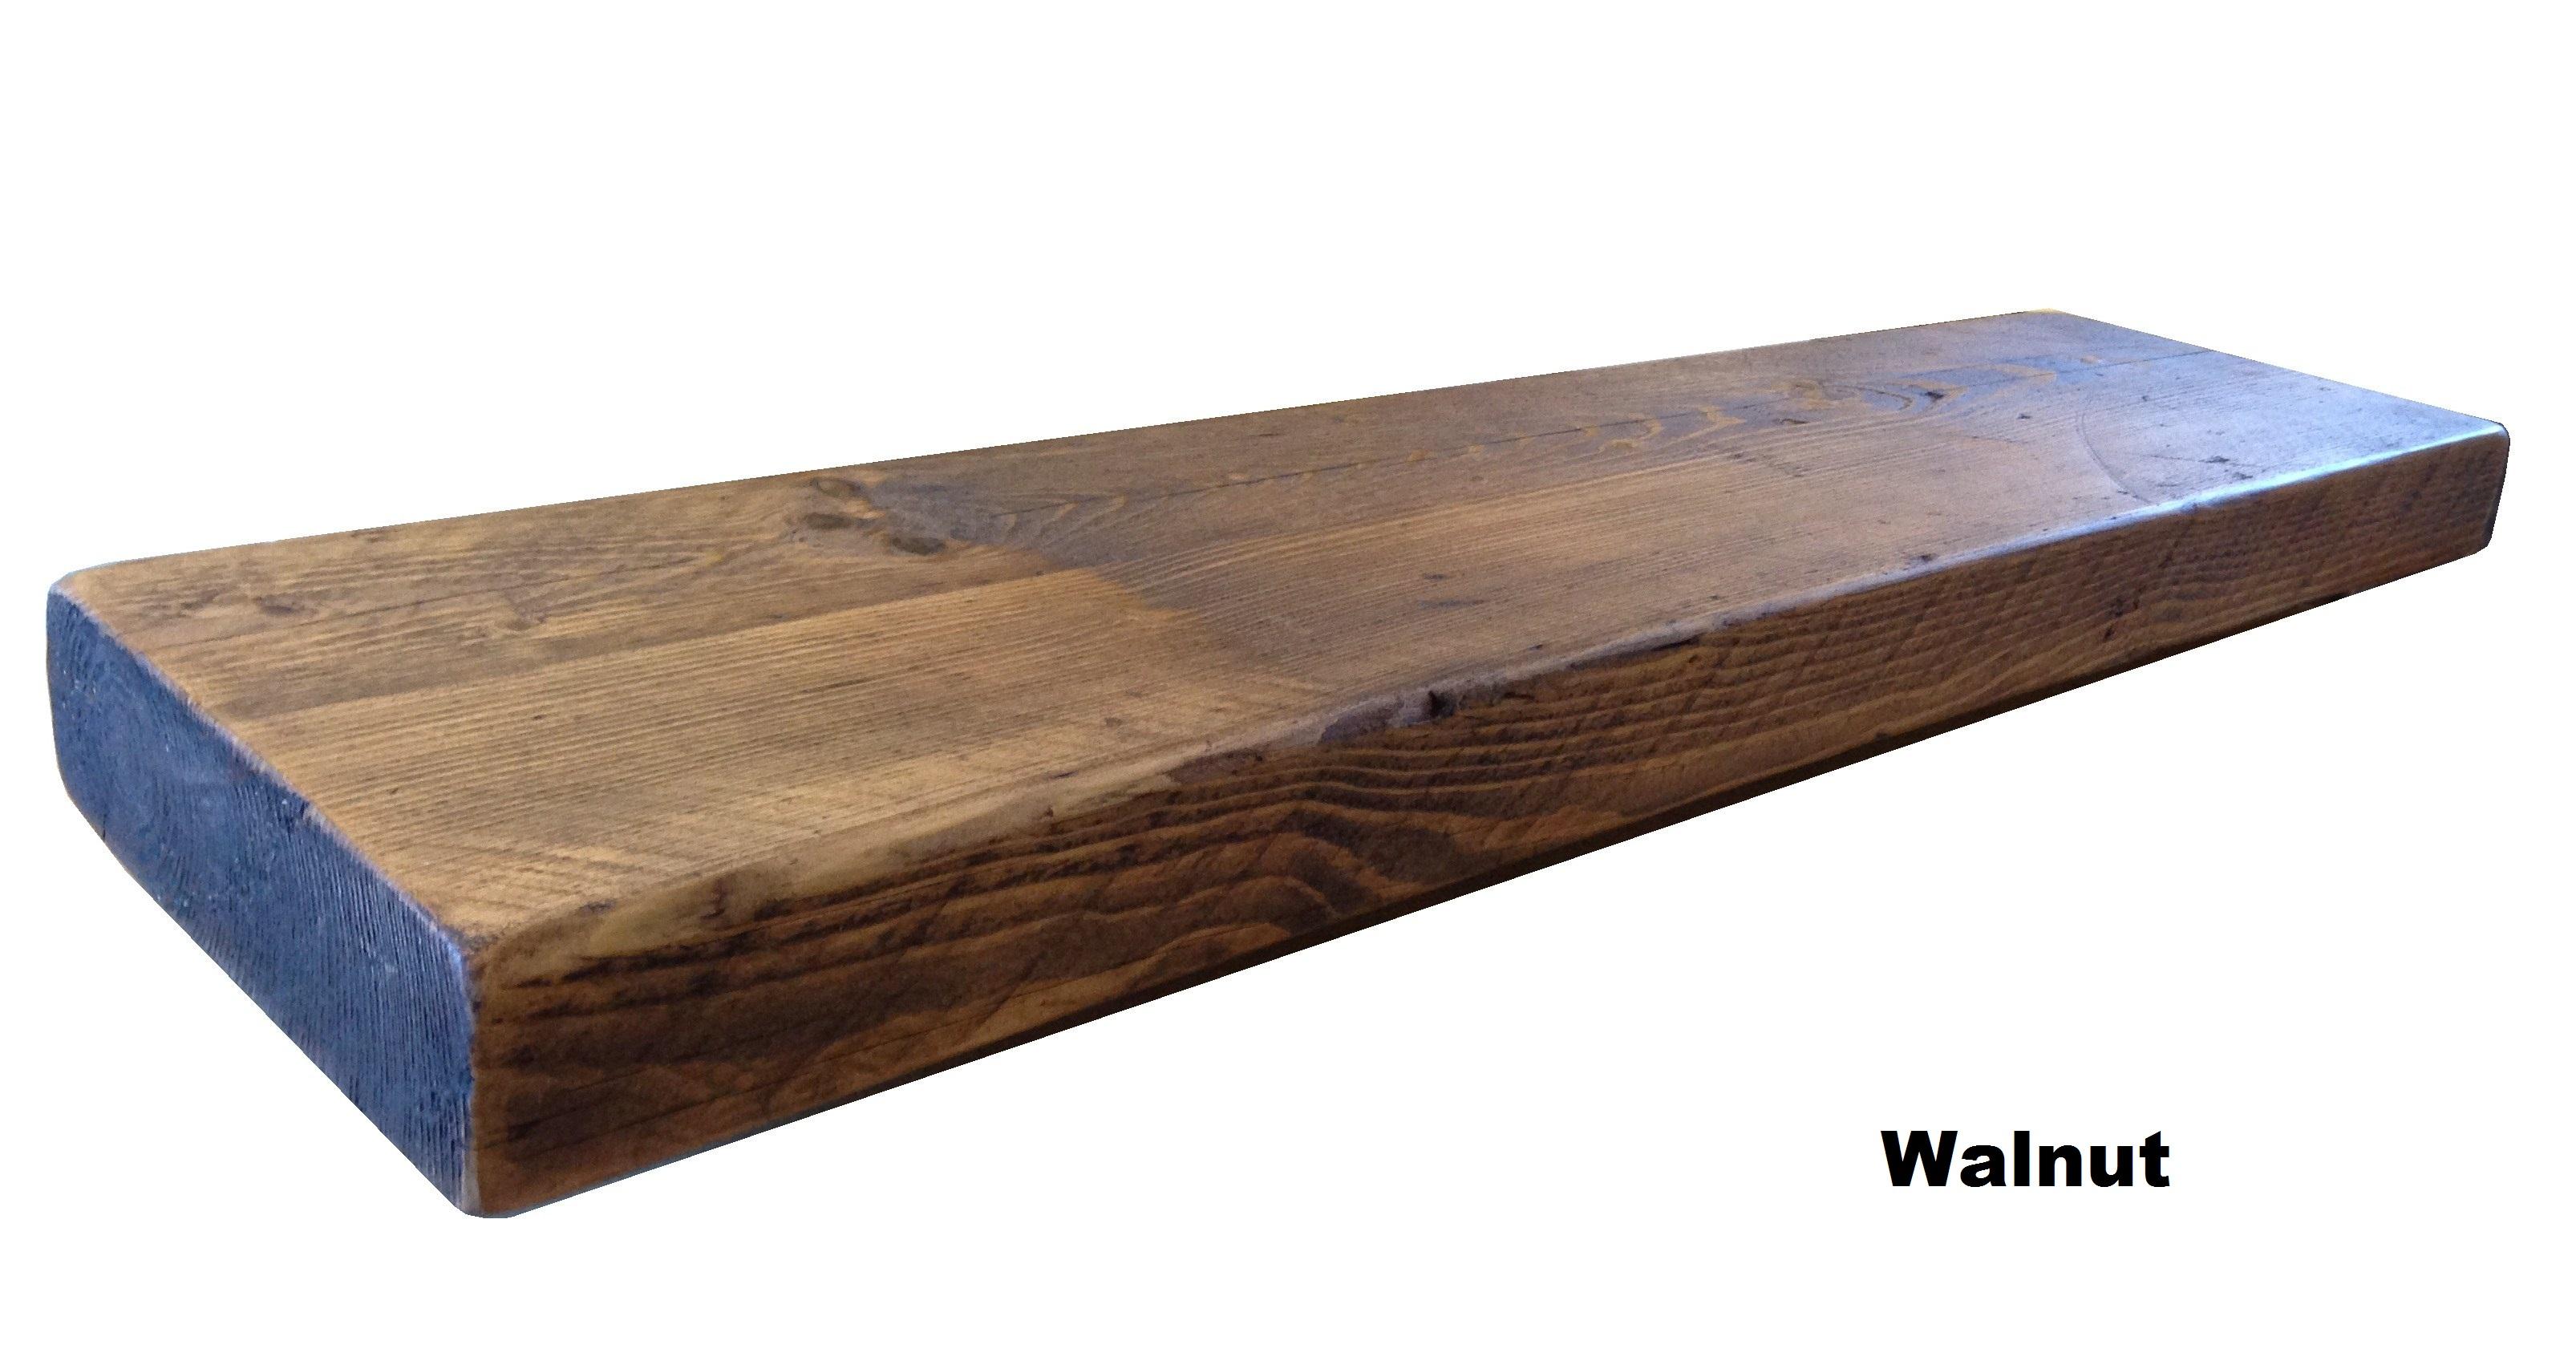 Chunky Wood Coffee Table: RECLAIMED CHUNKY FLOATING SHELF SHELVES WOODEN.